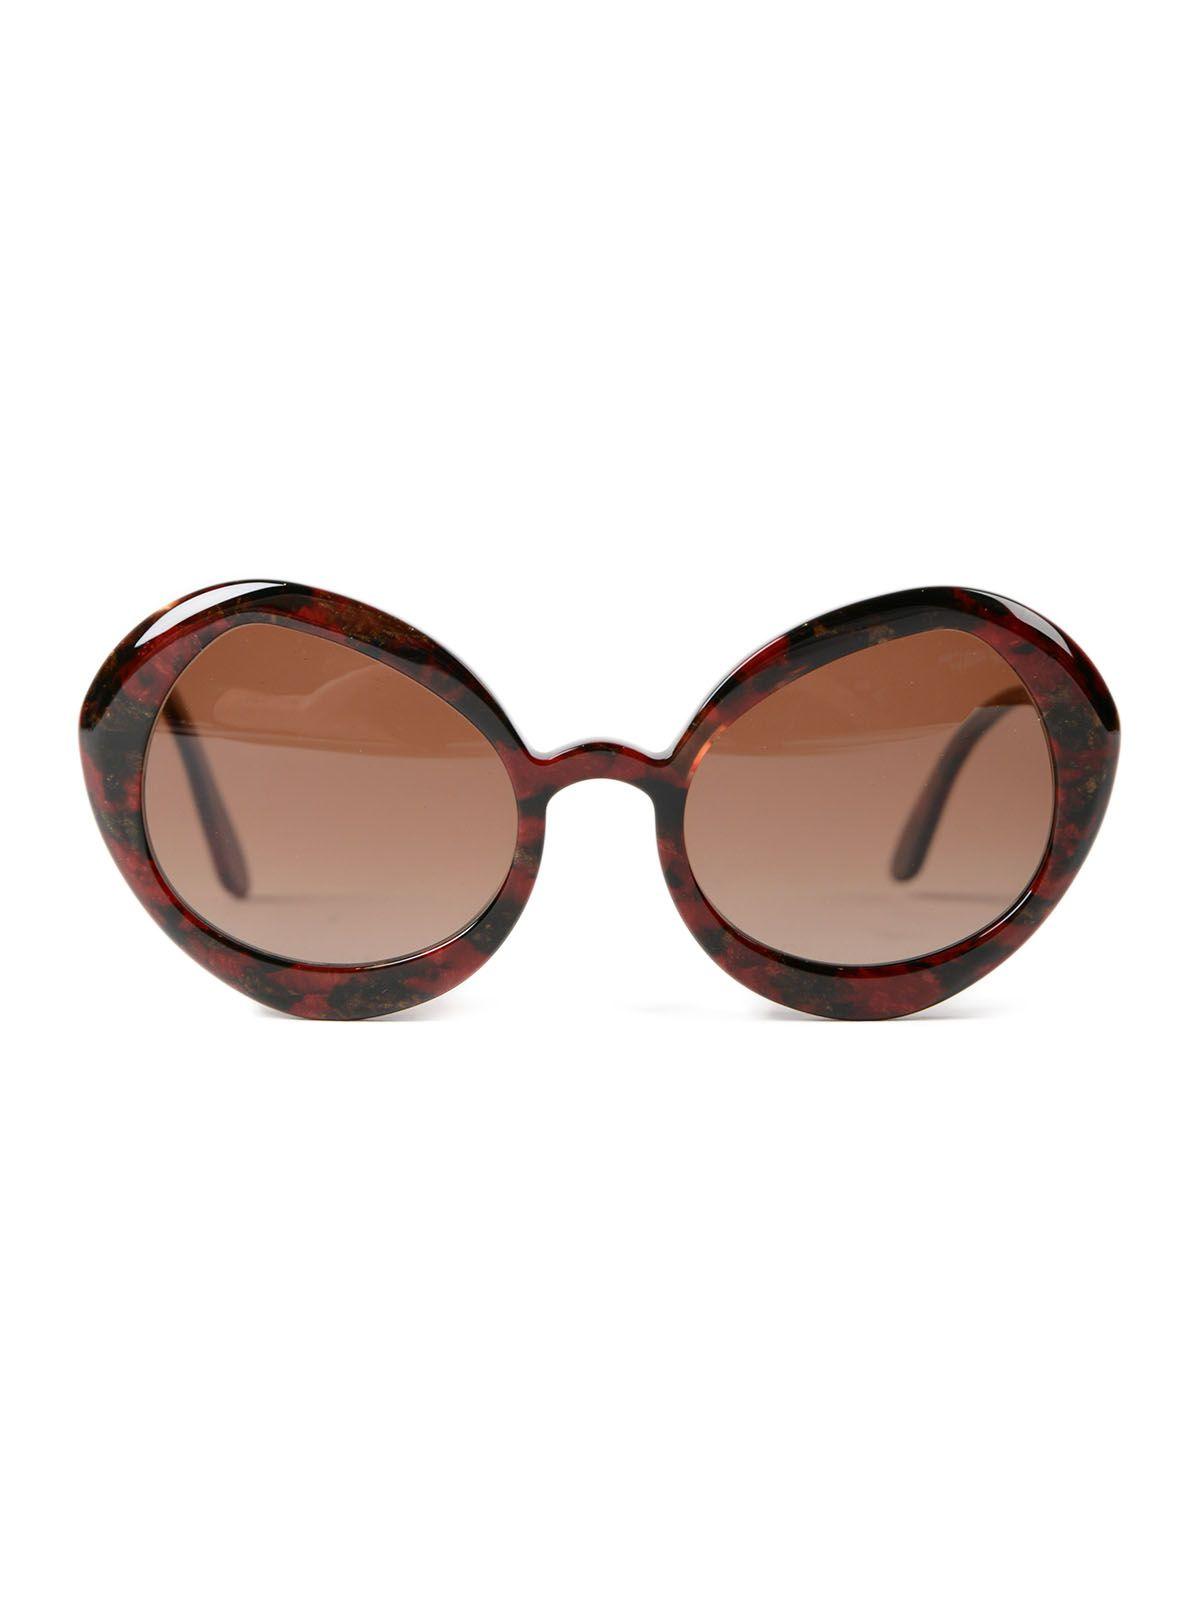 Delirious Round Frame Sunglasses